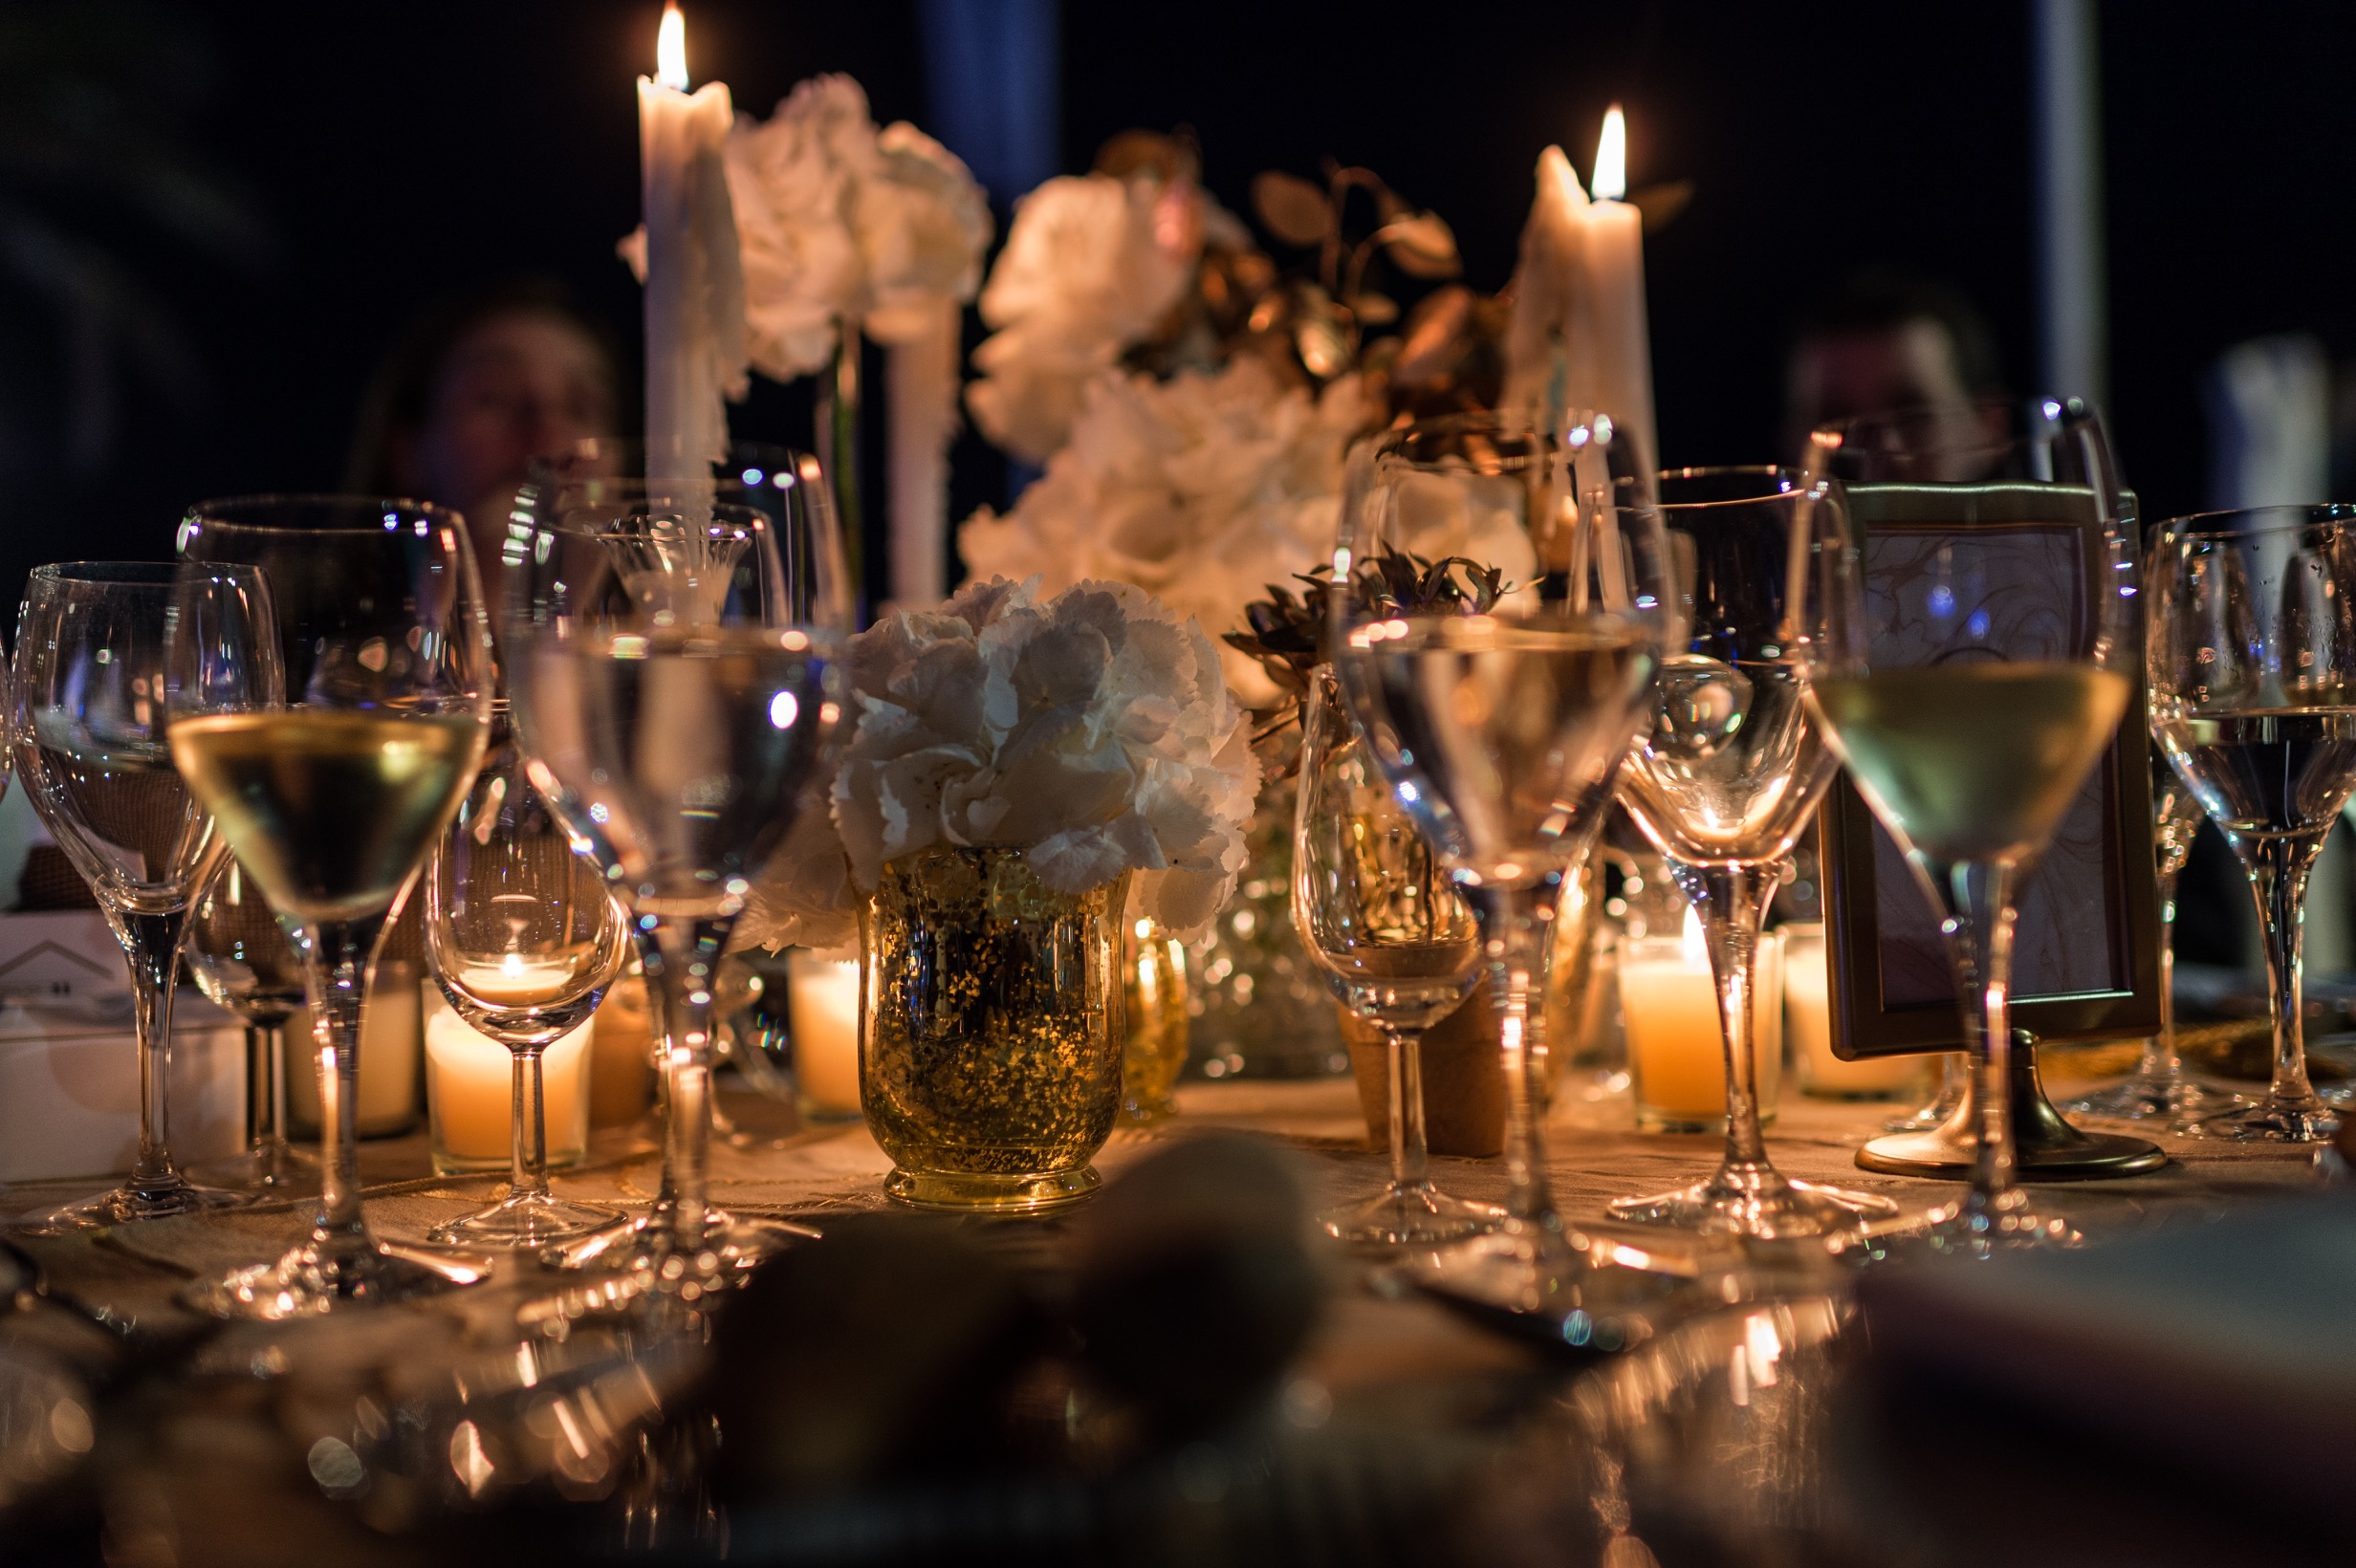 Si-Quiero-Wedding-Planner-By-Sira-Antequera-Bodas-Málaga-Marbella-Miami- Sandra-Rafa-19